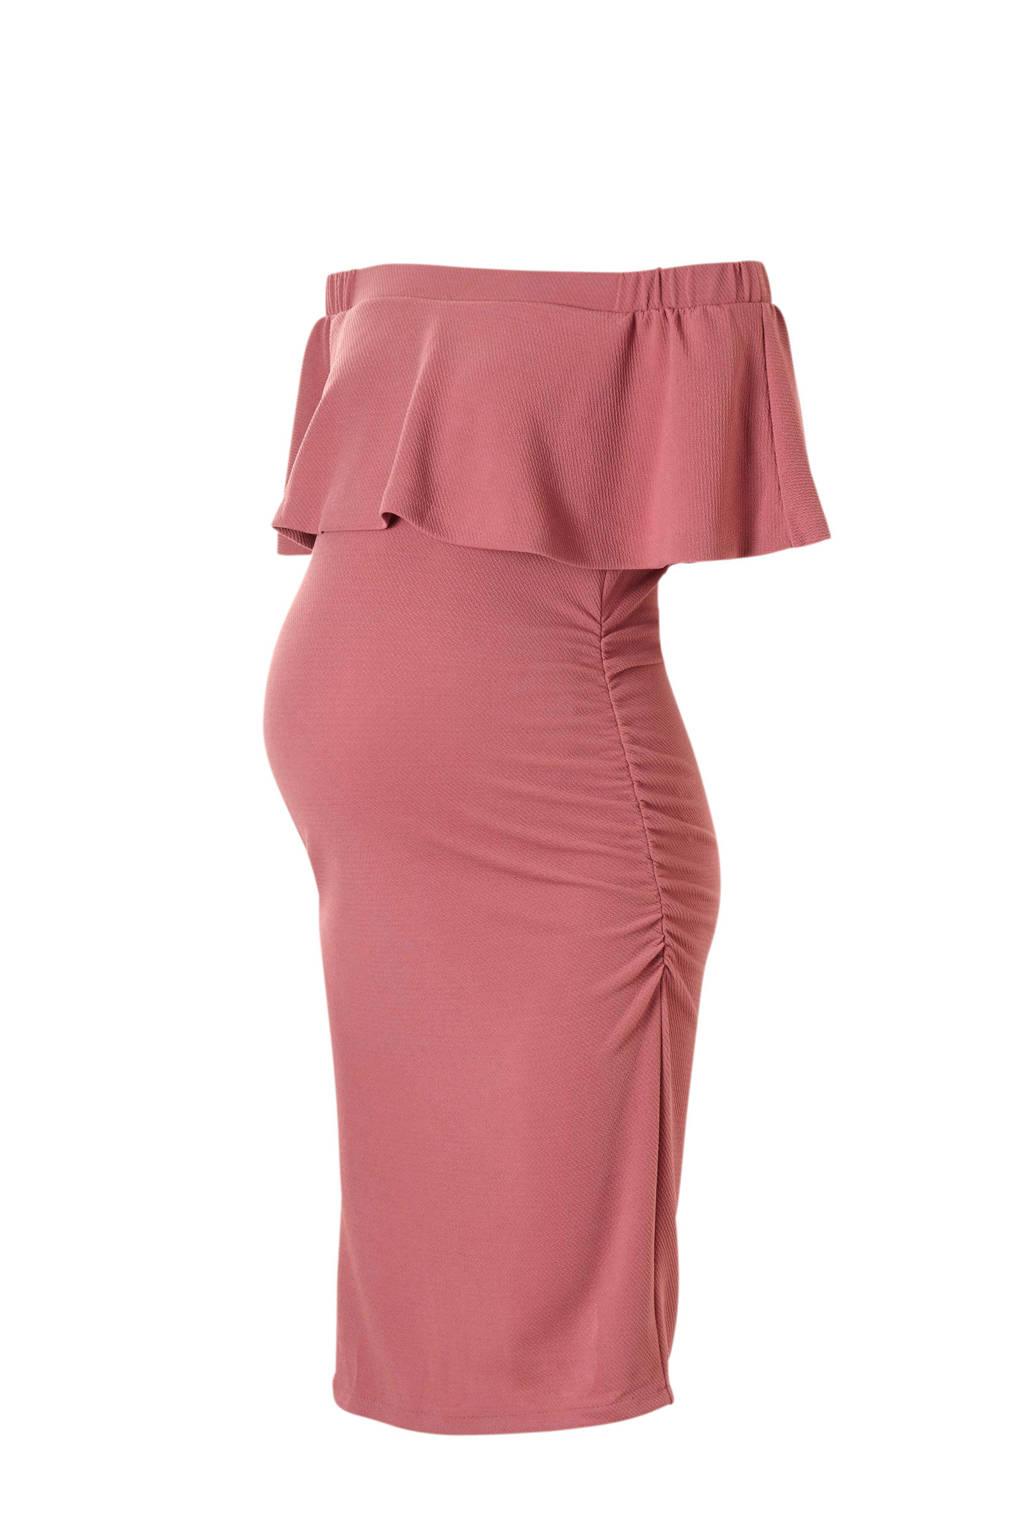 Ripe off shoulder zwangerschapsjurk Soiree met volant roze, Roze